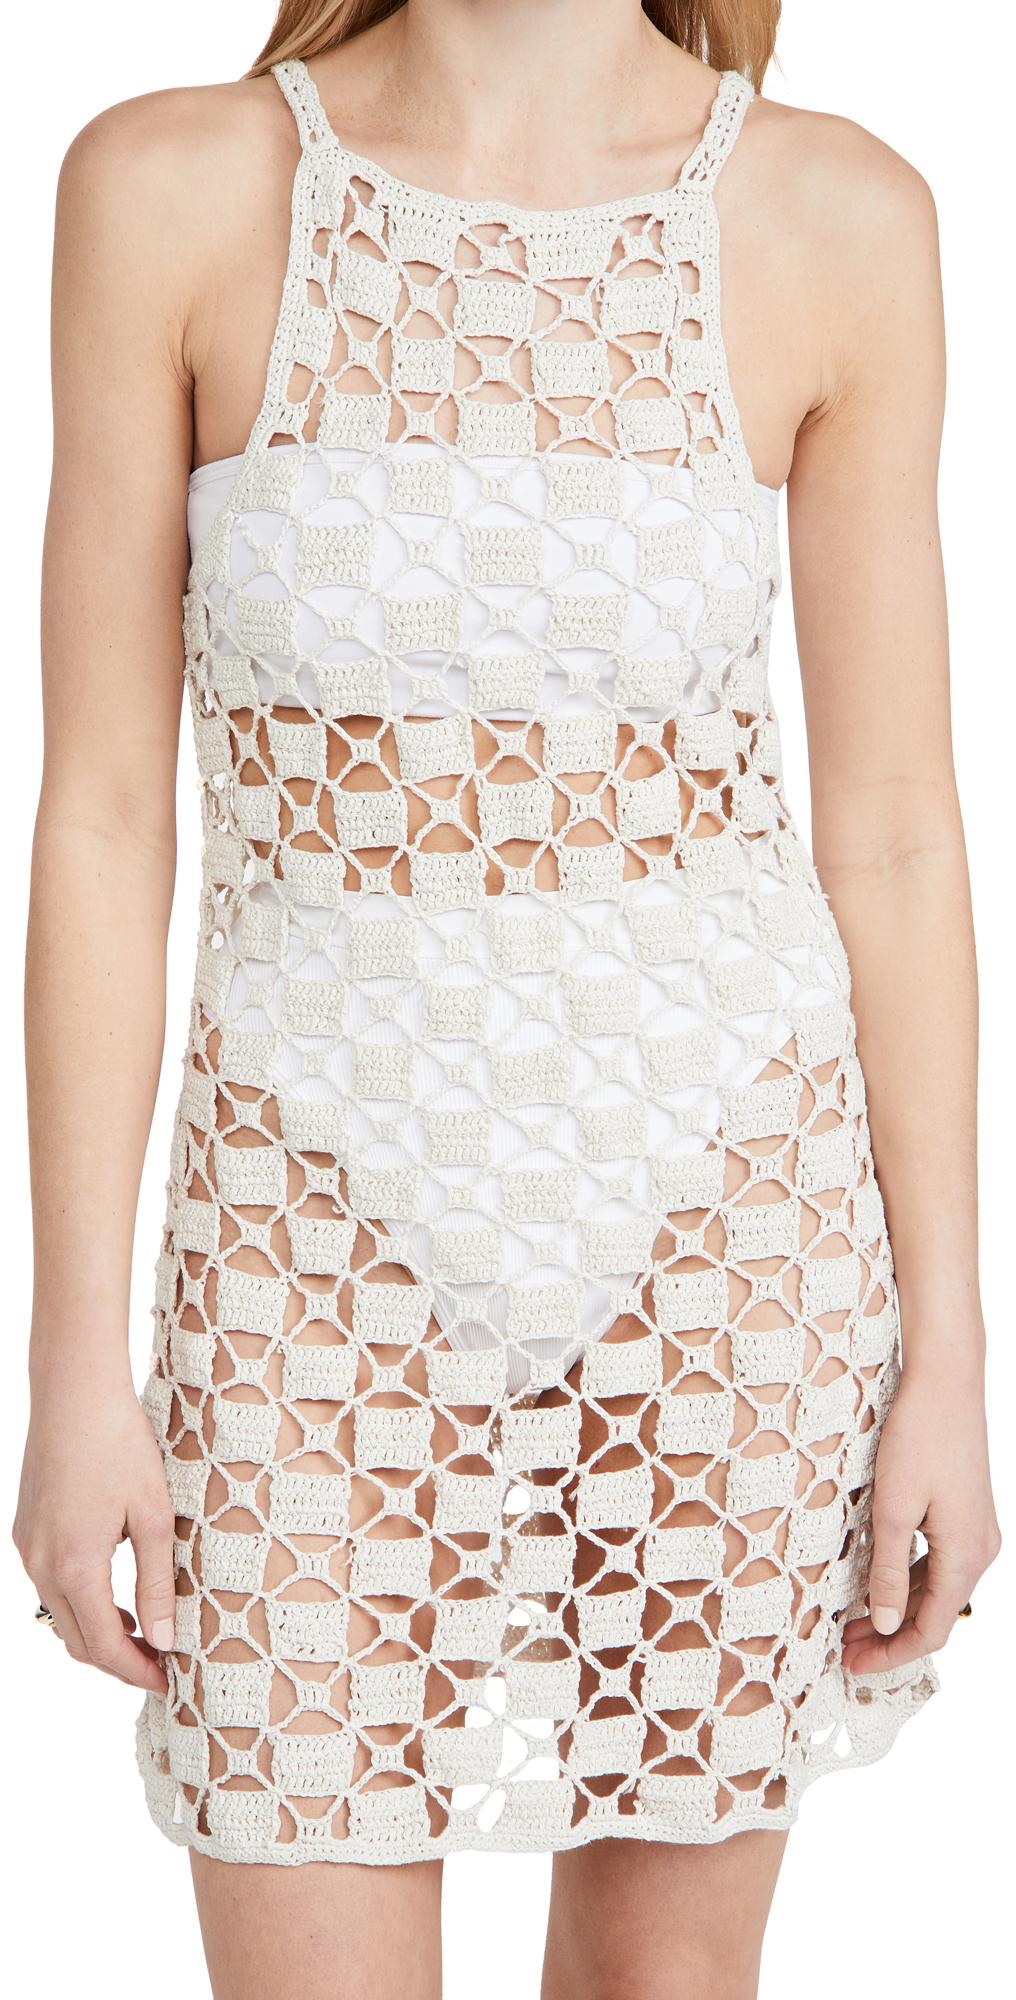 Cult Gaia Yara Knit Cover Up Dress